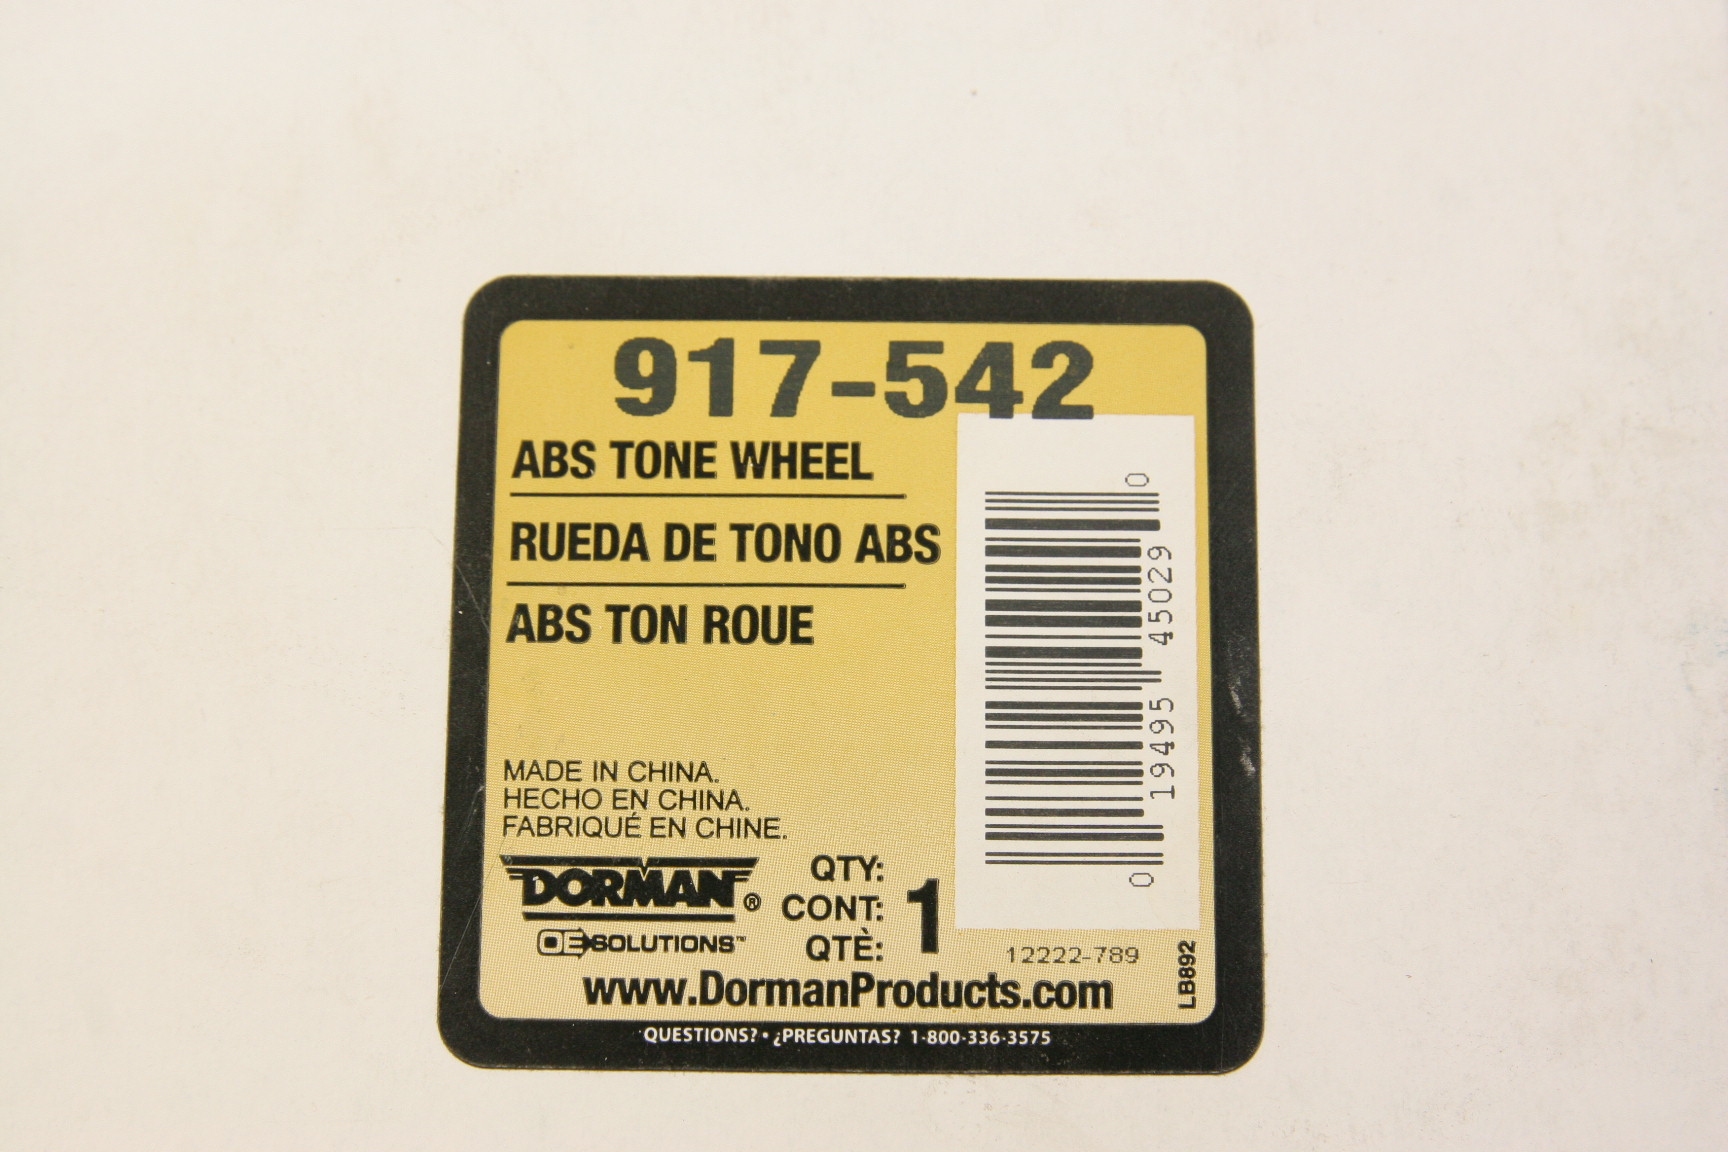 ** Dorman 917-542 ABS Ring Front Left Right 94-00 Honda Accord 95-98 Acura TL